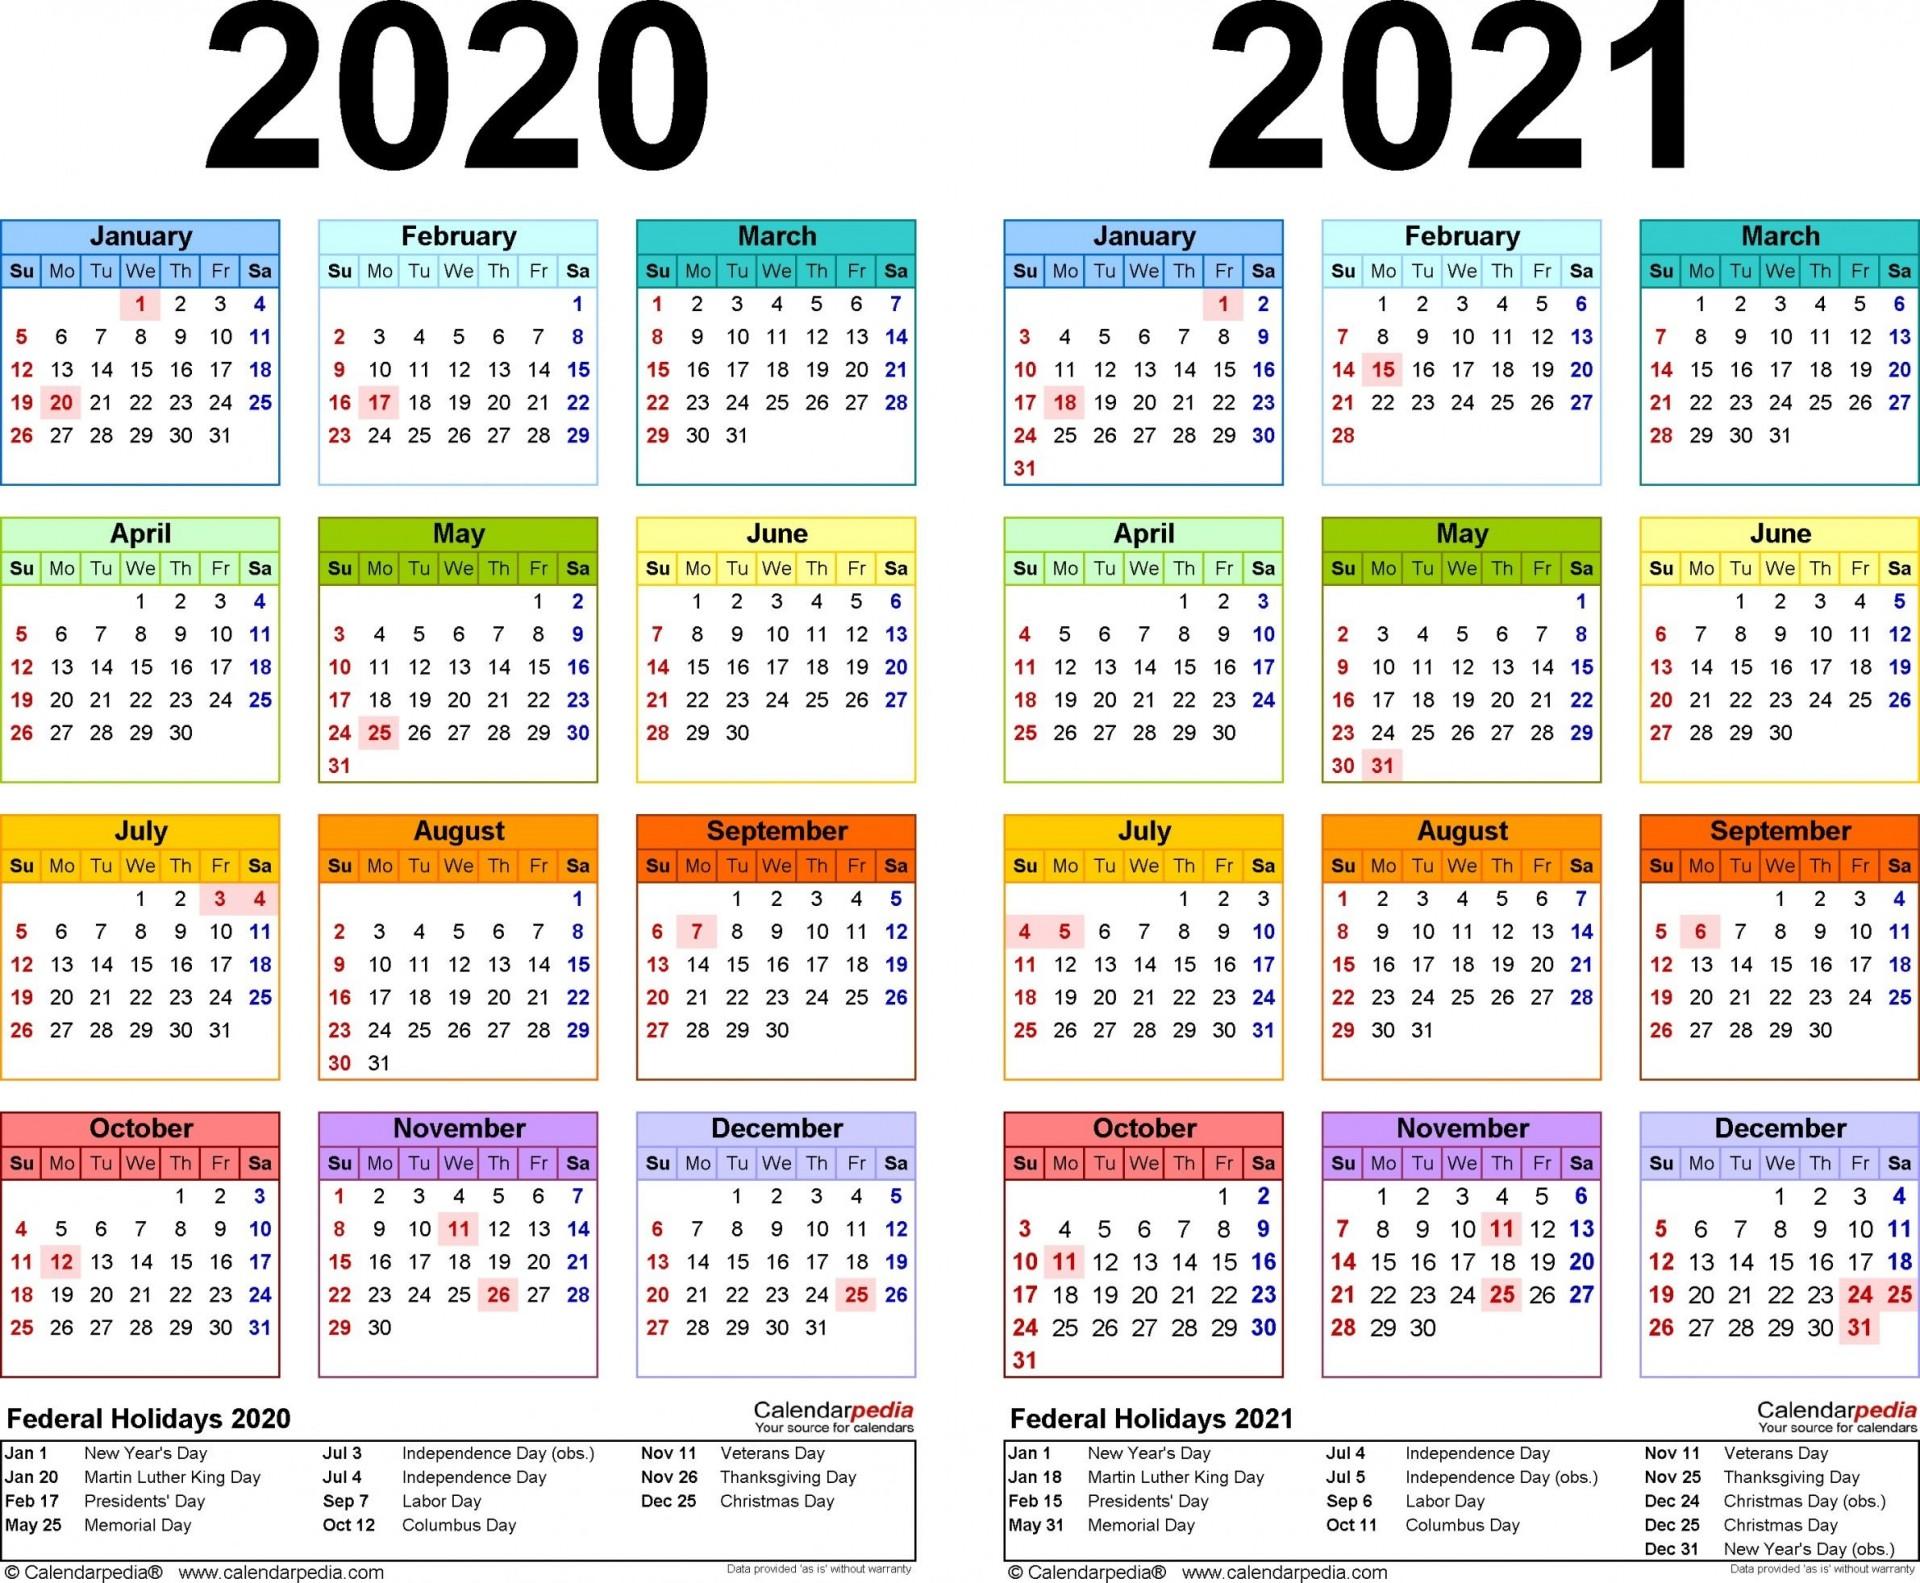 000 Top School Year Calendar Template High Resolution  Excel 2019-20 Word1920